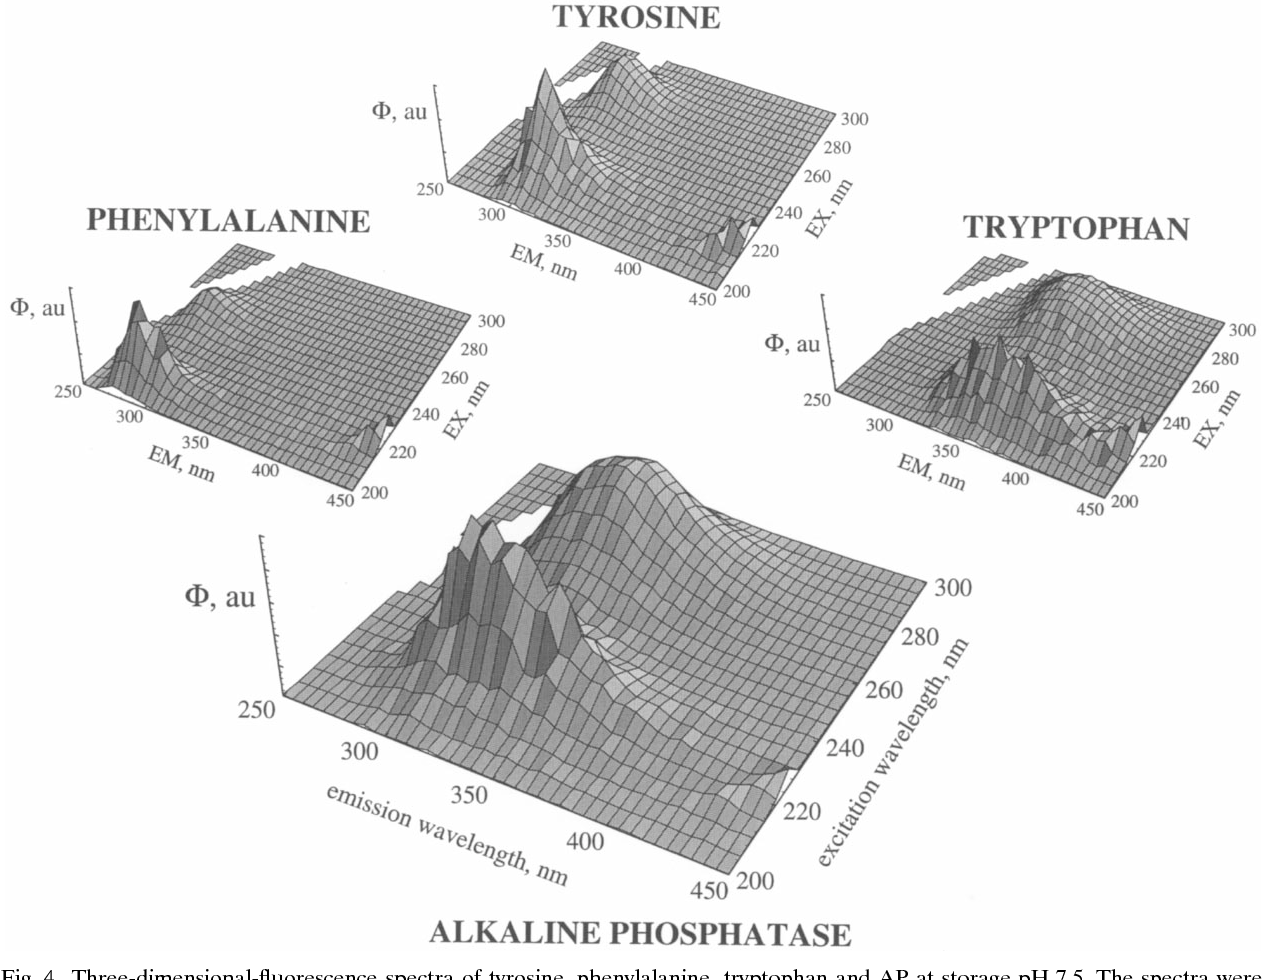 Opposite of alkaline